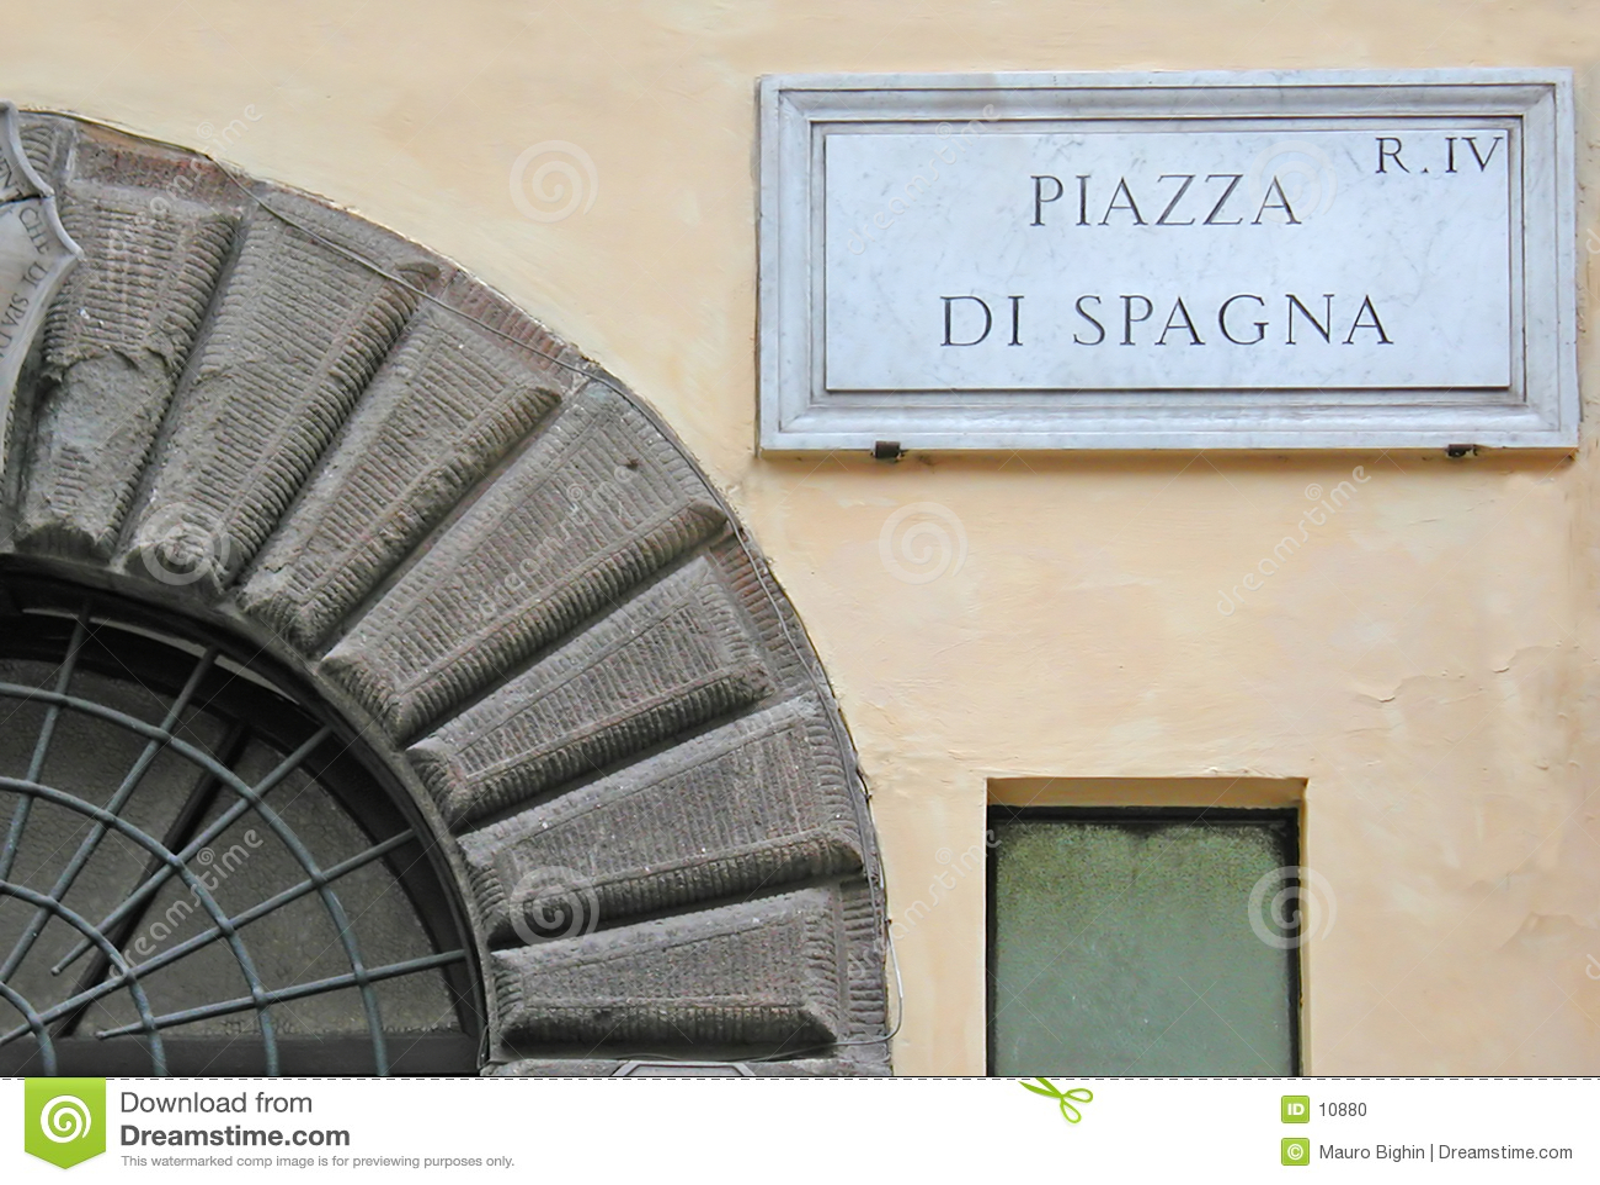 Signe de Piazza di Spagna - Rome - Italie